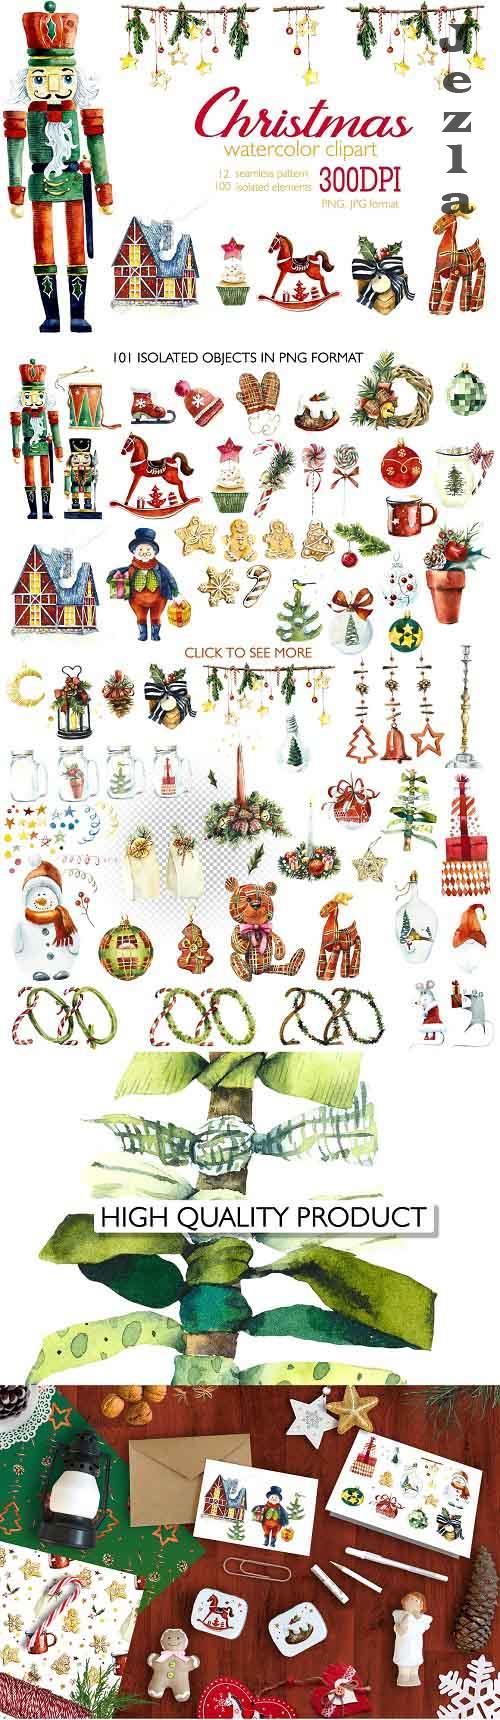 Christmas Decor - 4209432